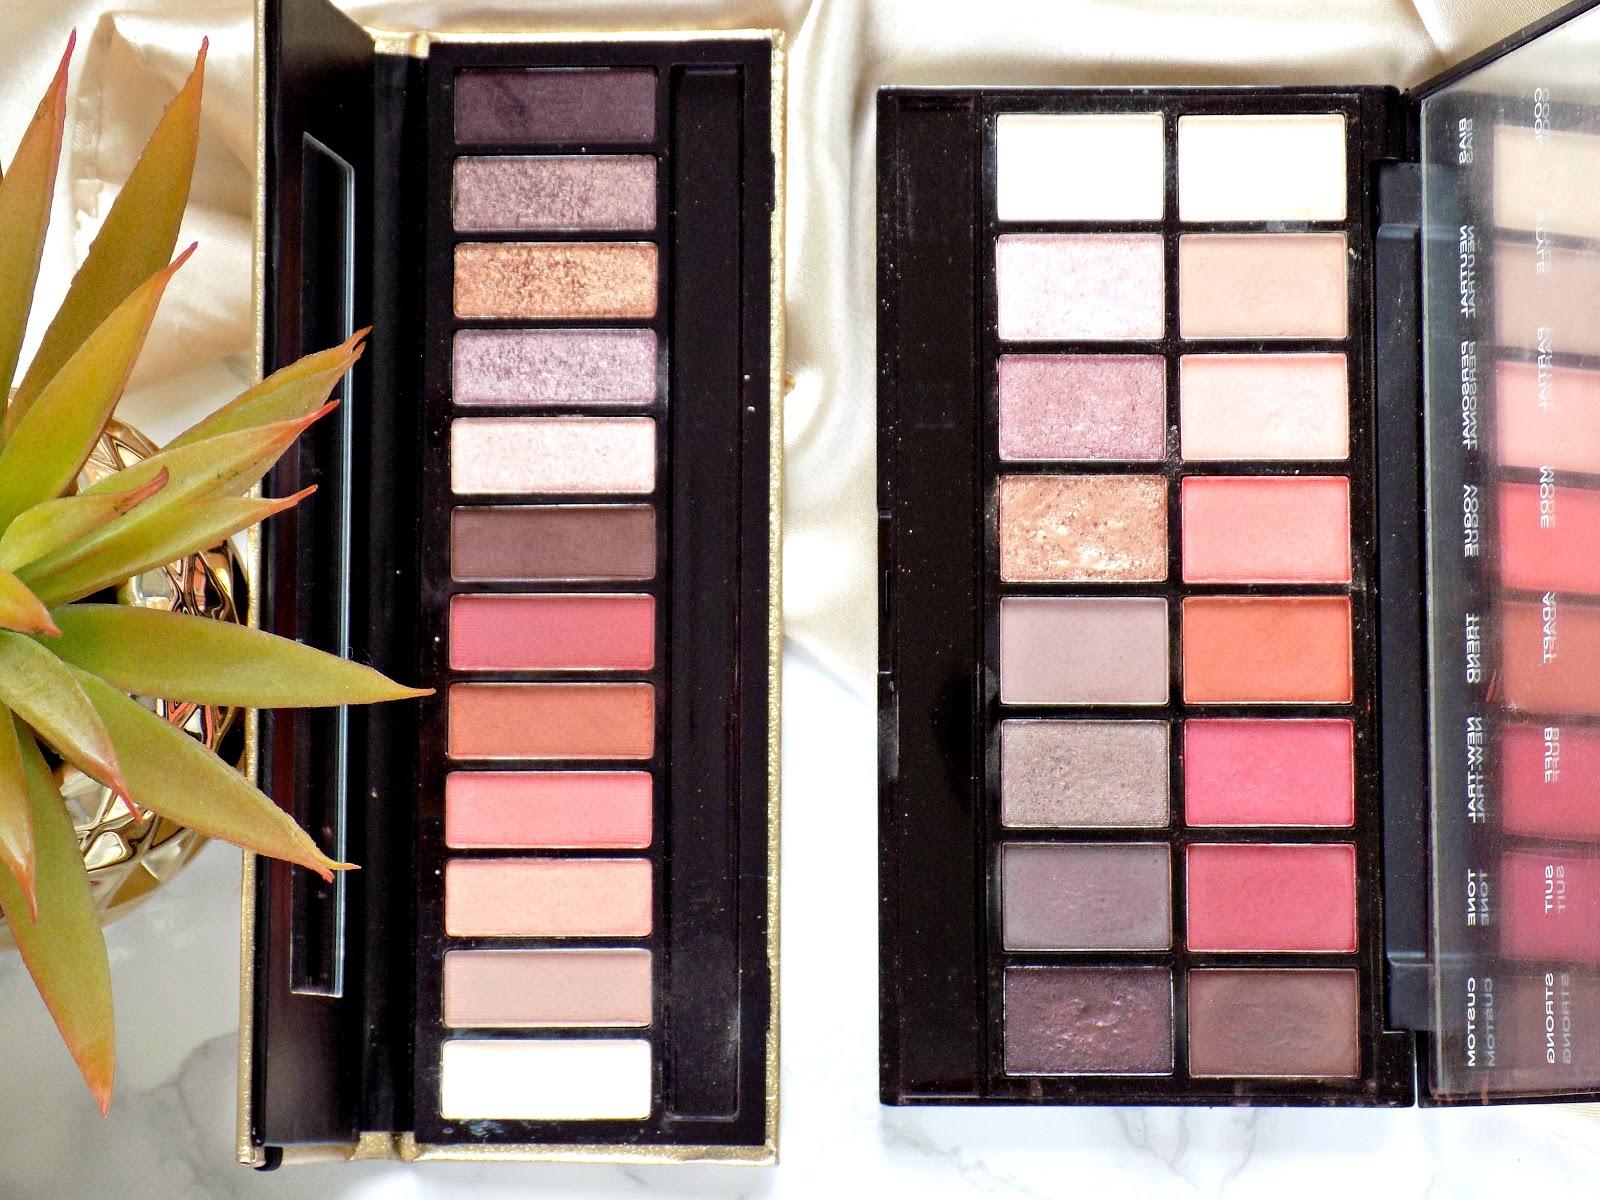 GWA Bombshell Eyeshadow Palette vs MUR New-trals vs Neutrals palette